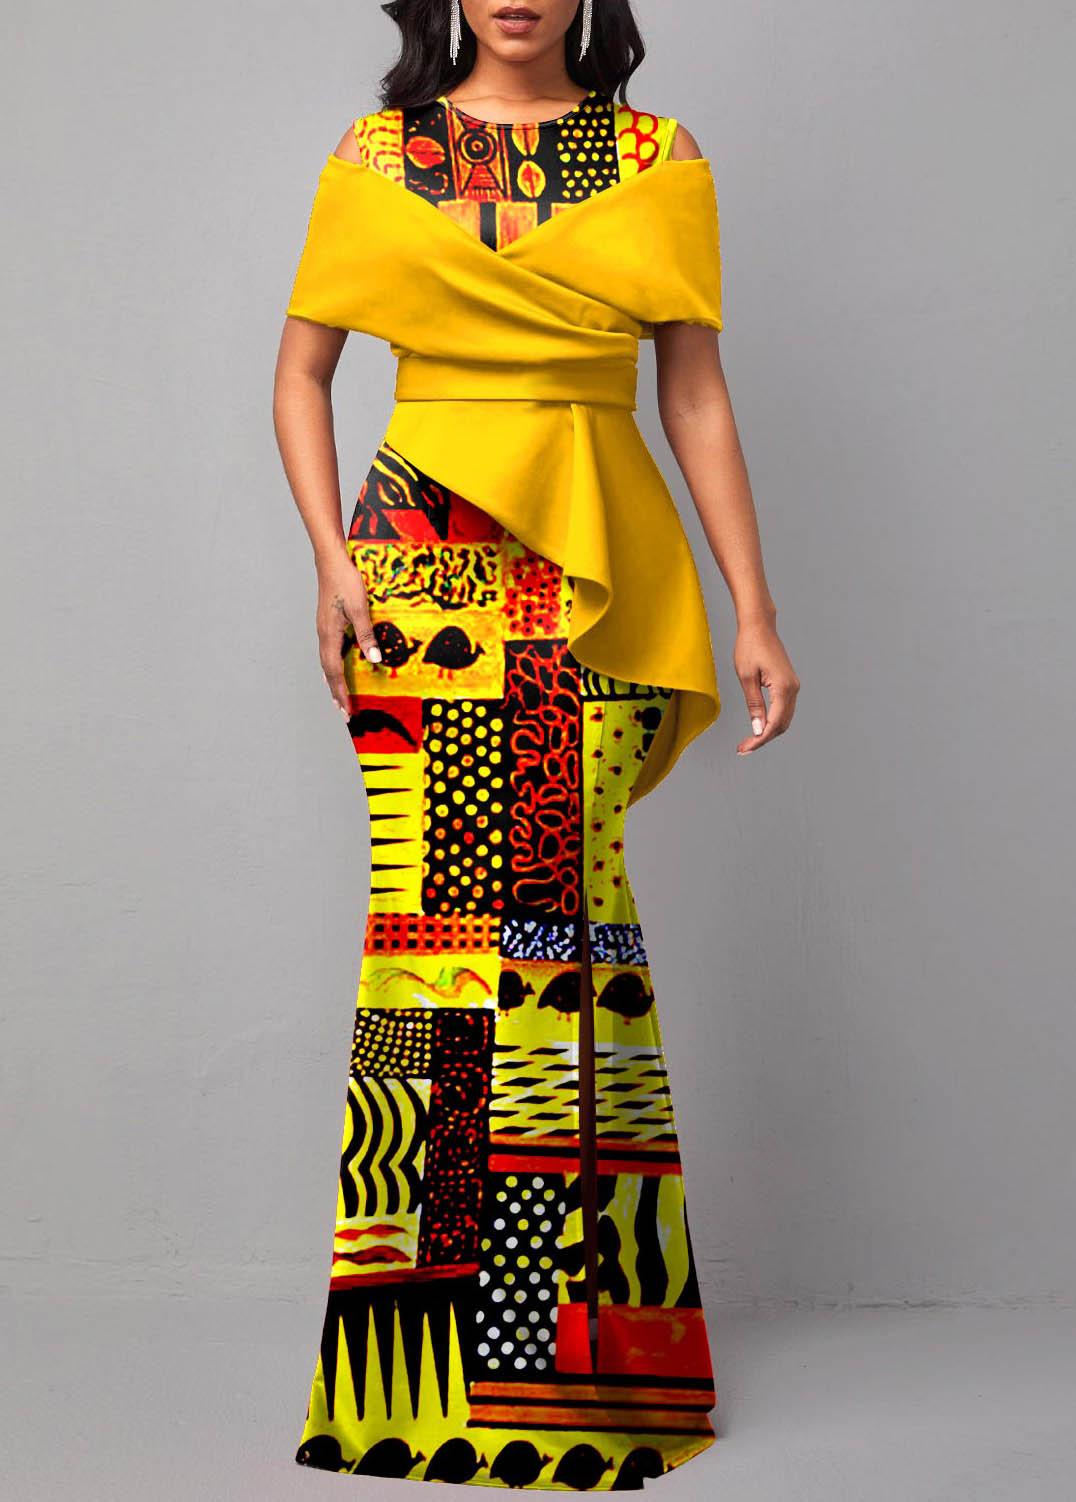 ROTITA Tribal Print Round Neck Short Sleeve Dress